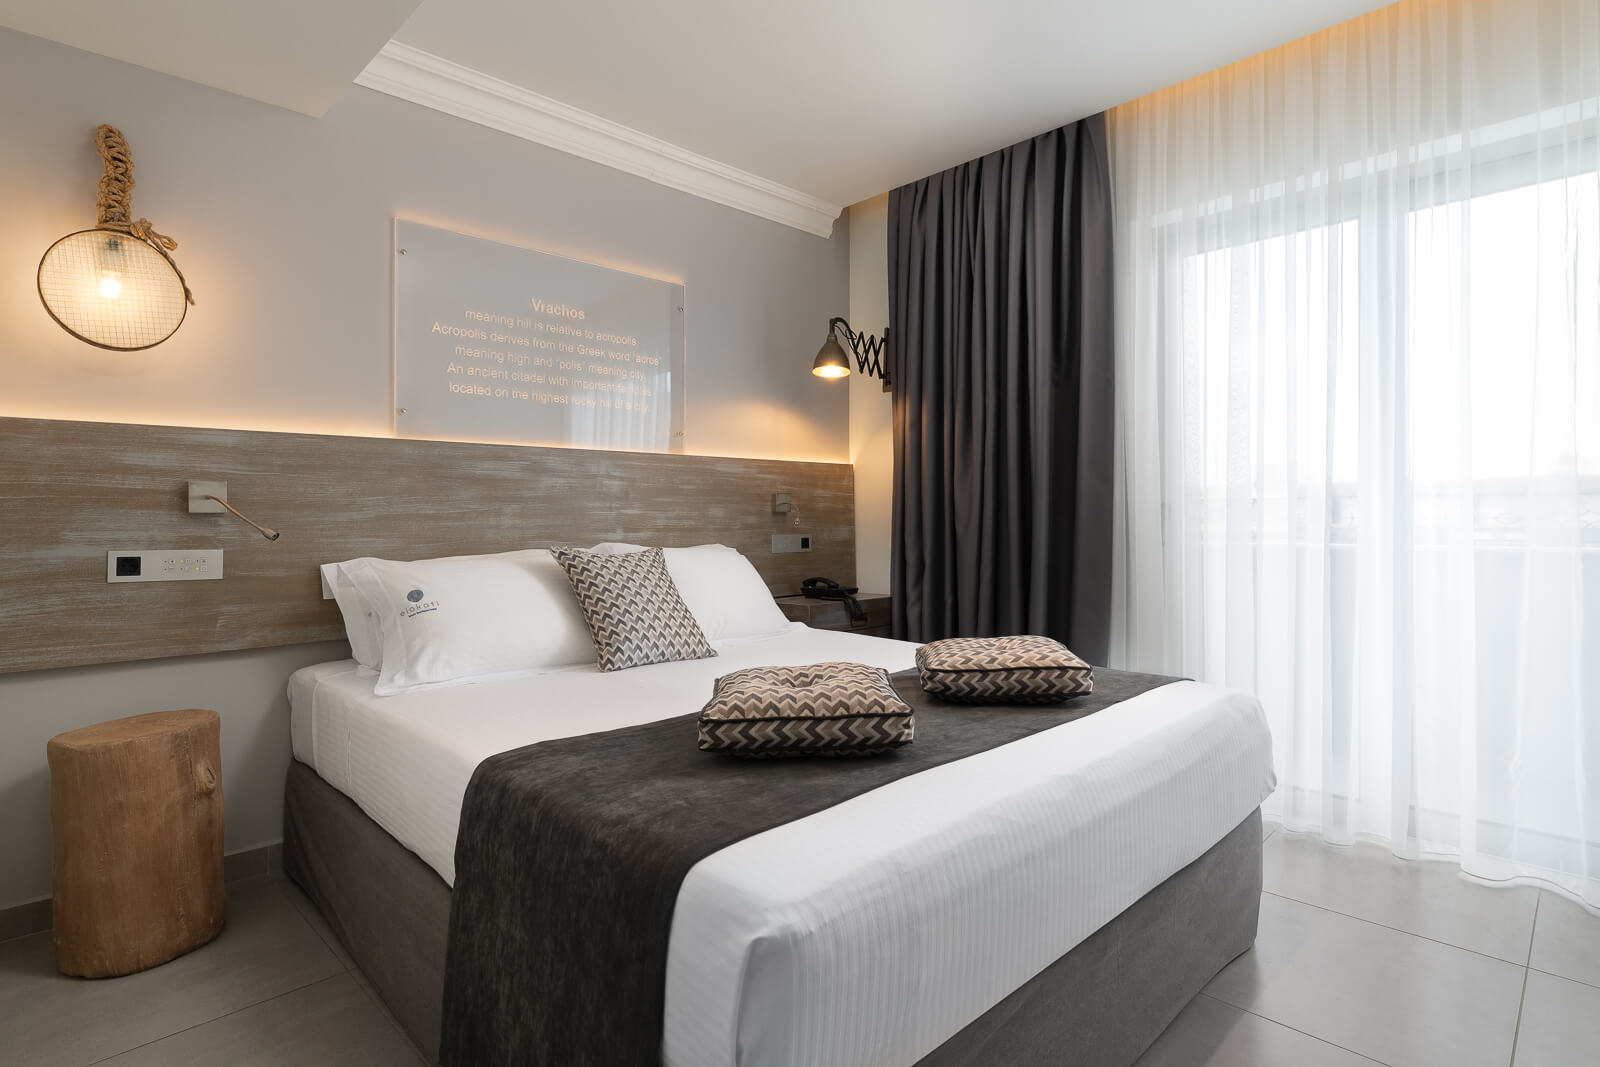 Vrachos Themed Room - Elakati Hotel in Rhodes Greece